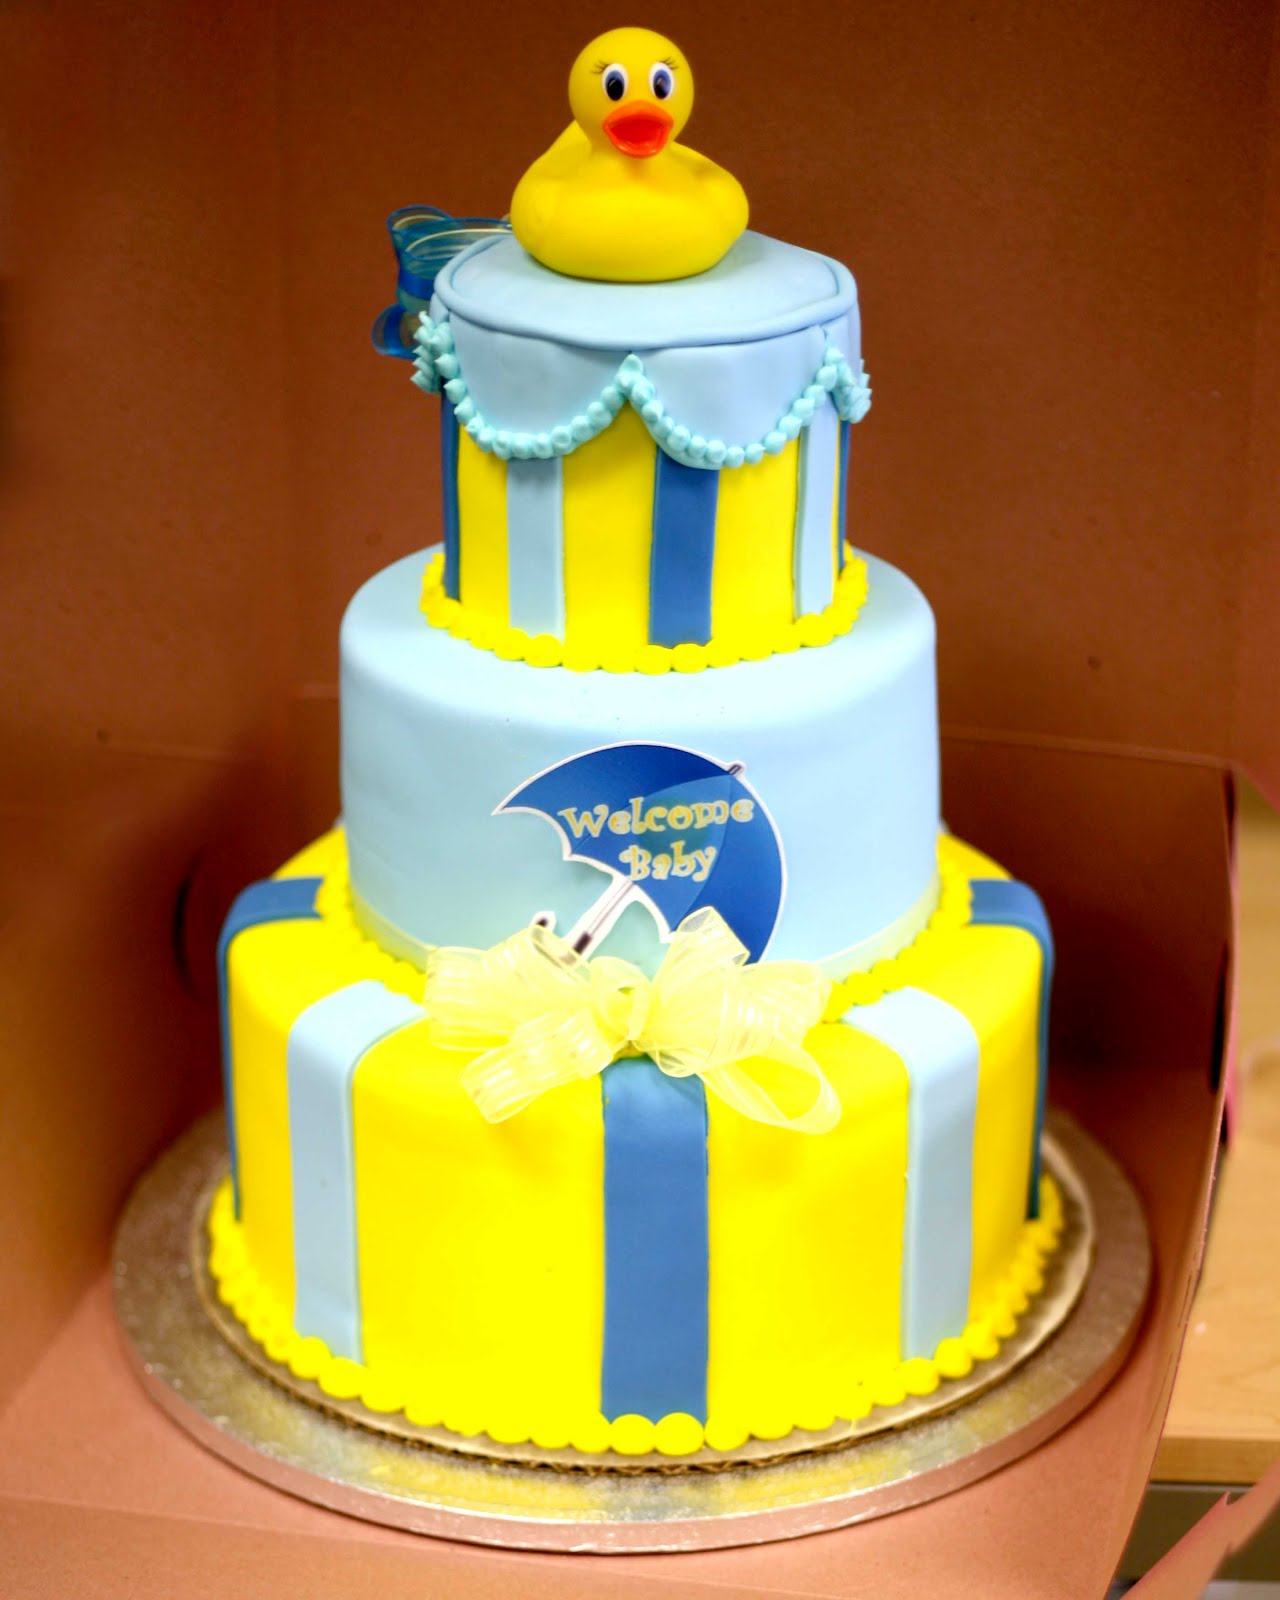 Hectors Custom Cakes FONDANT BABY SHOWER CAKE